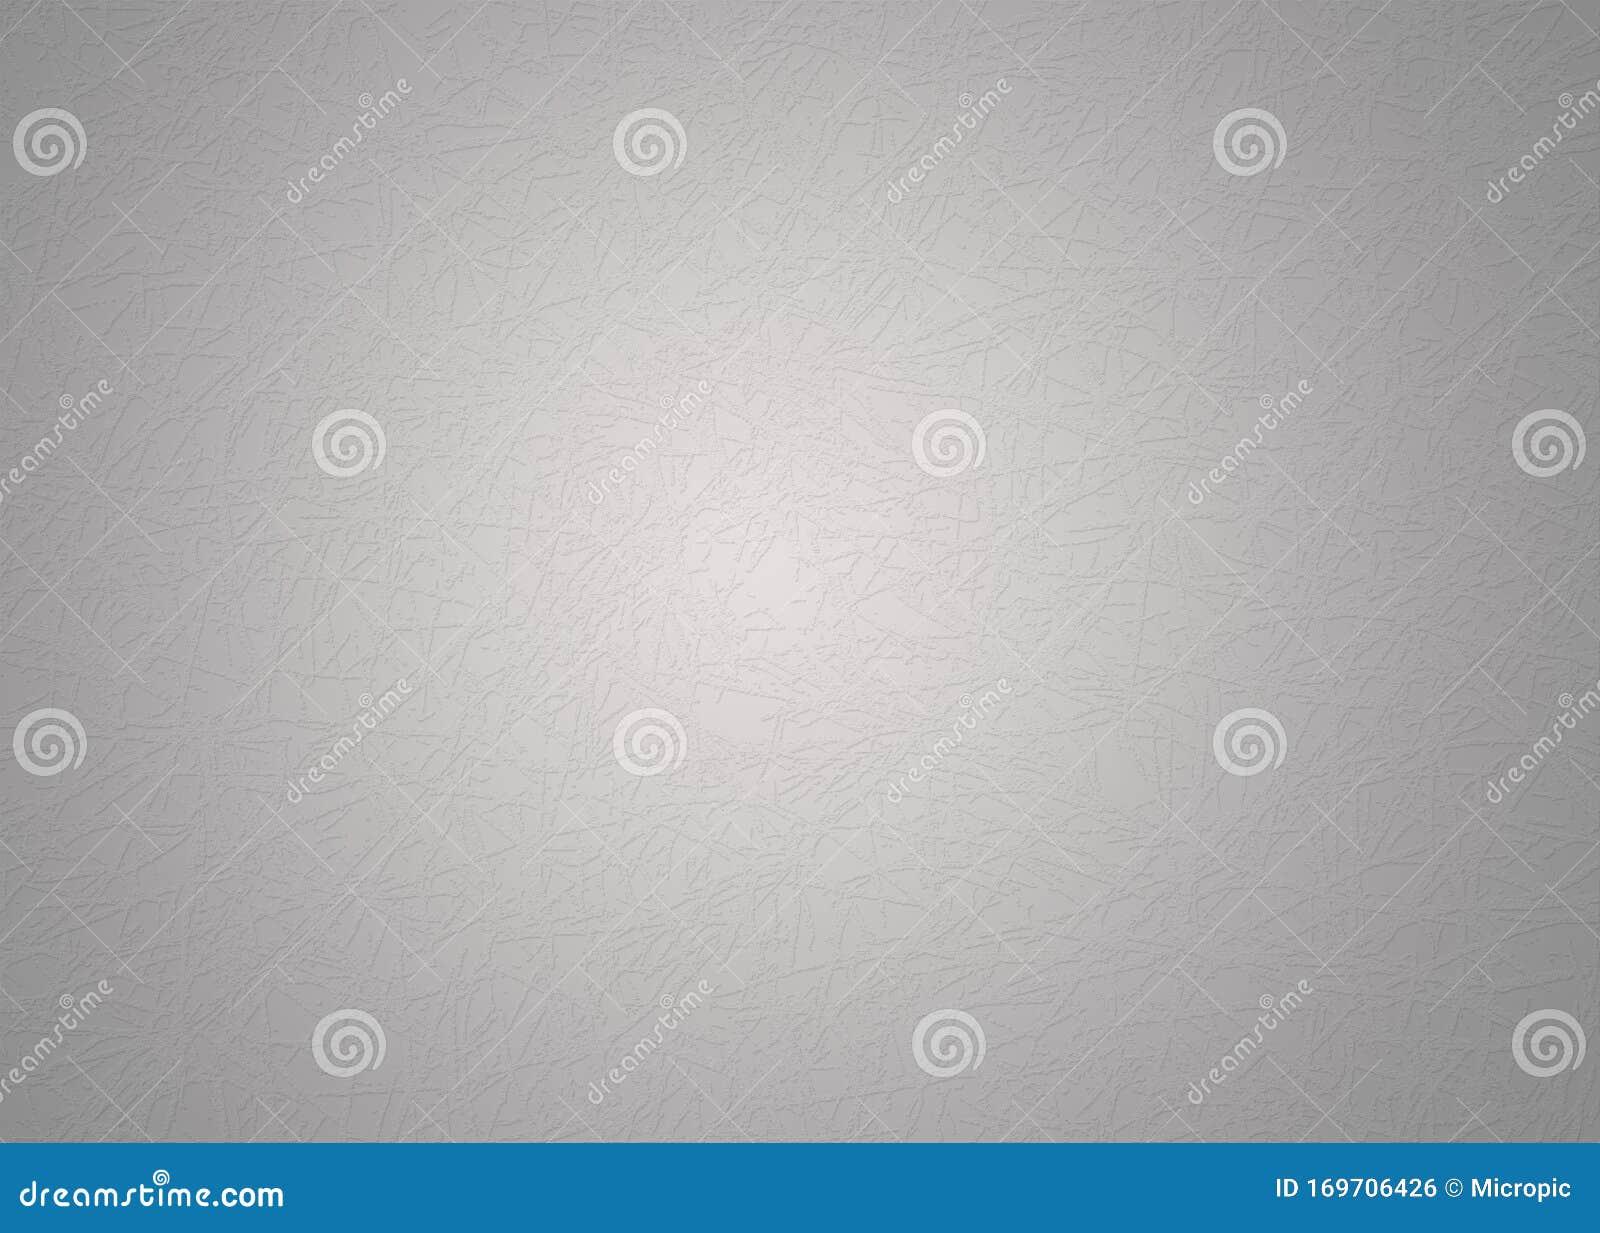 Grey Grunge Effect Background Wallpaper Stock Photo Image Of